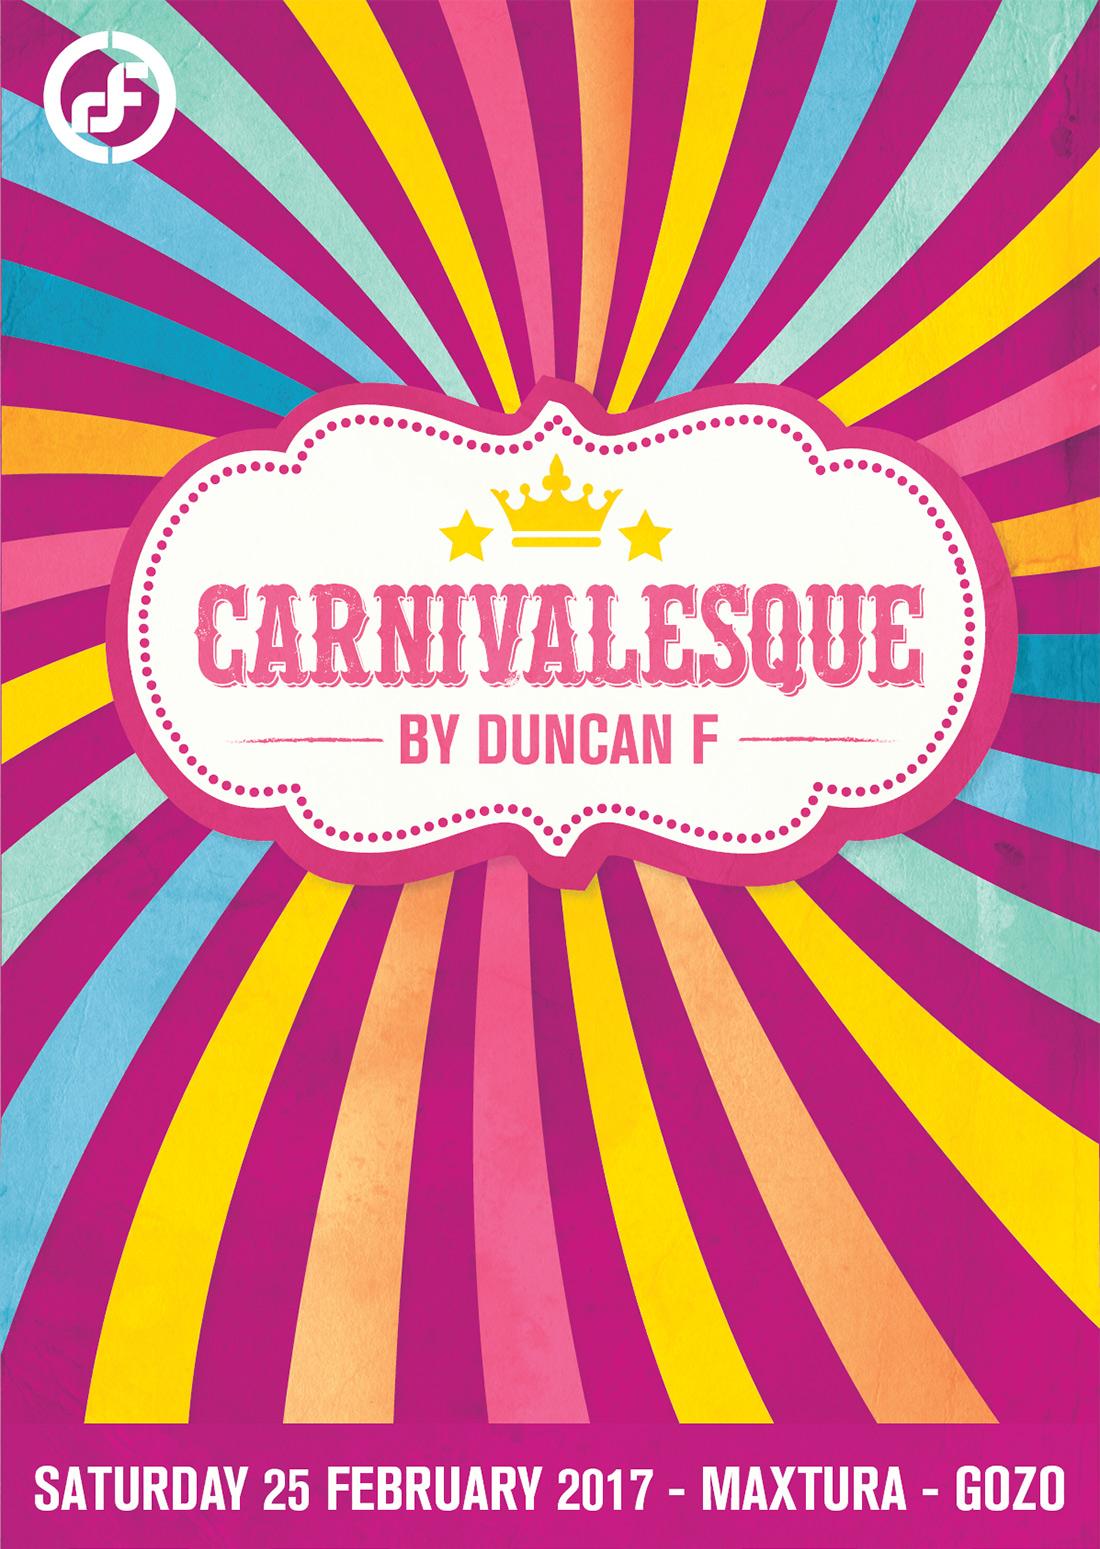 Carnivalesque flyer